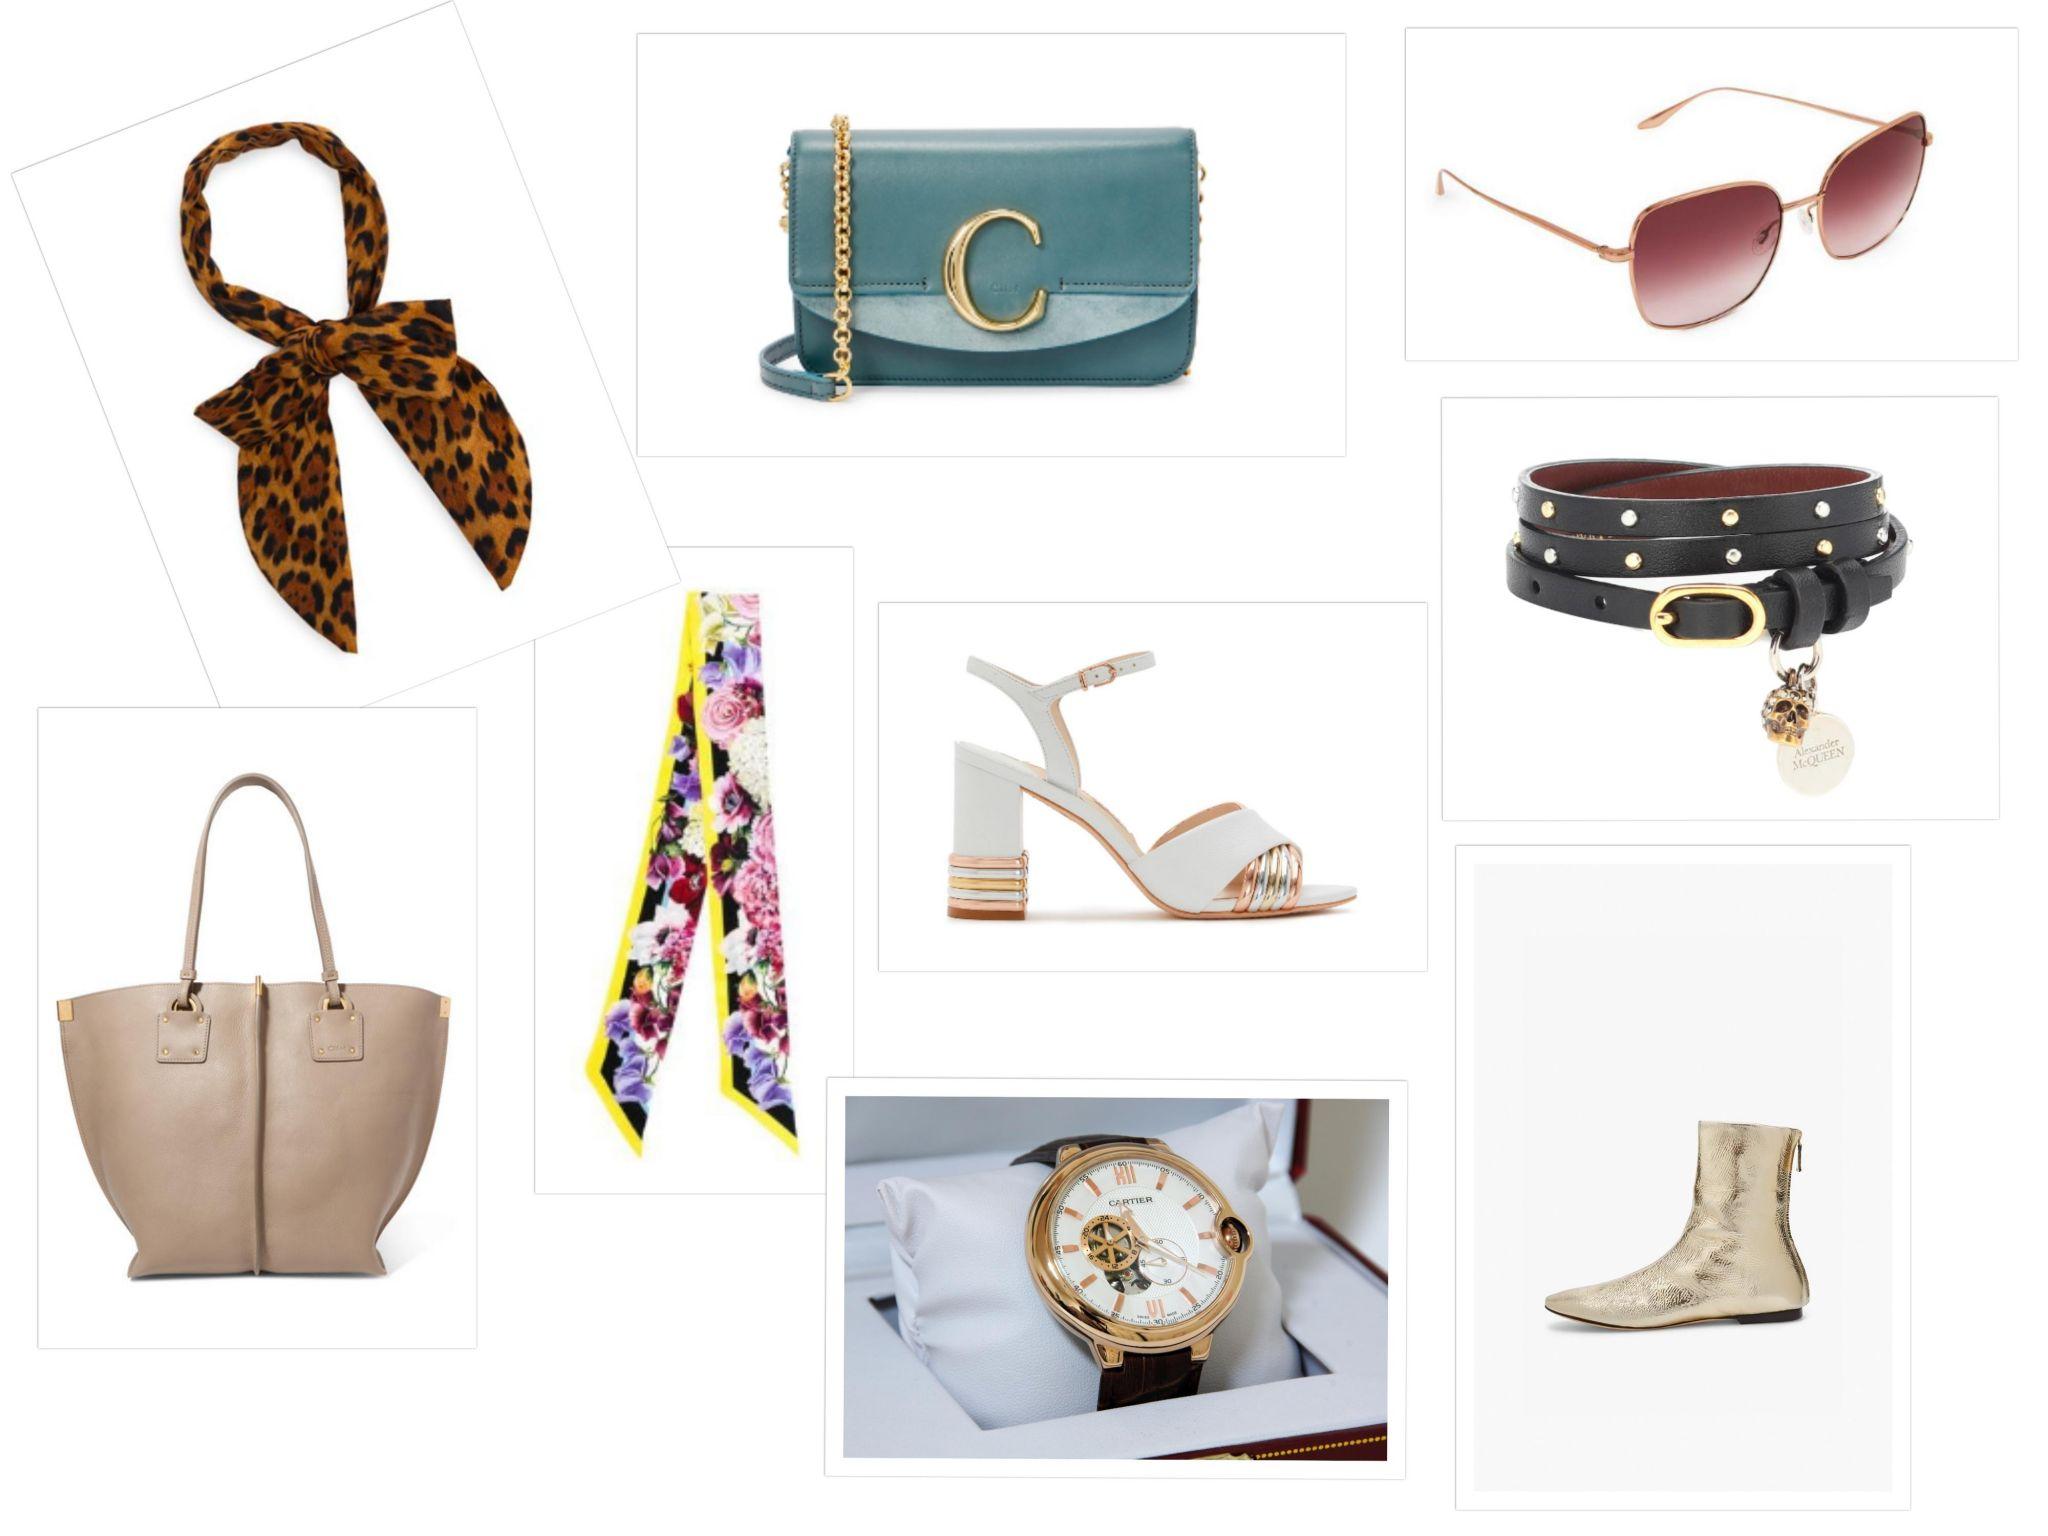 spring 2019 luxury fashion accessories